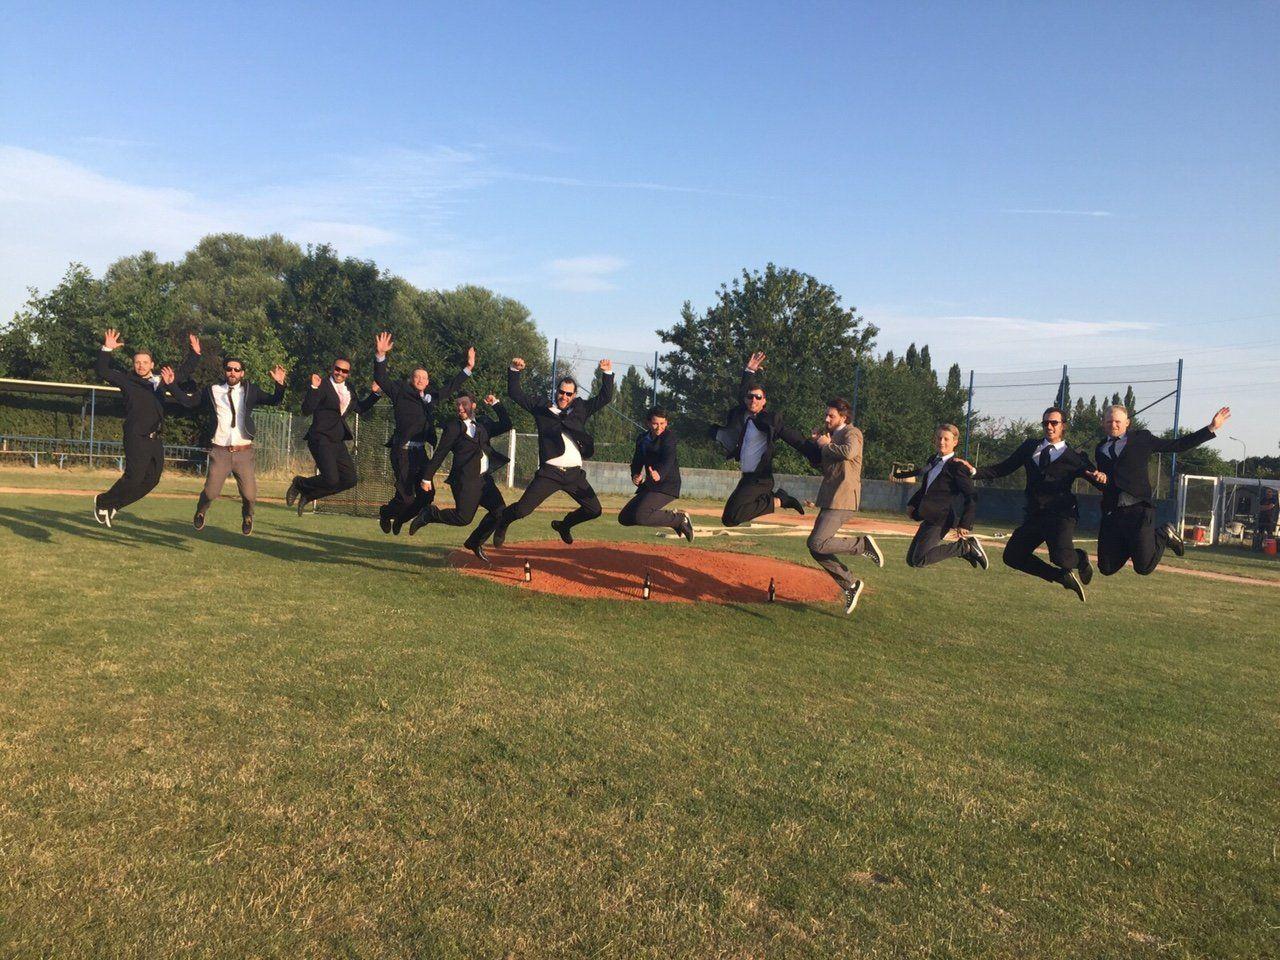 Baseball Champions 2015 - die Bulls aus Hard!